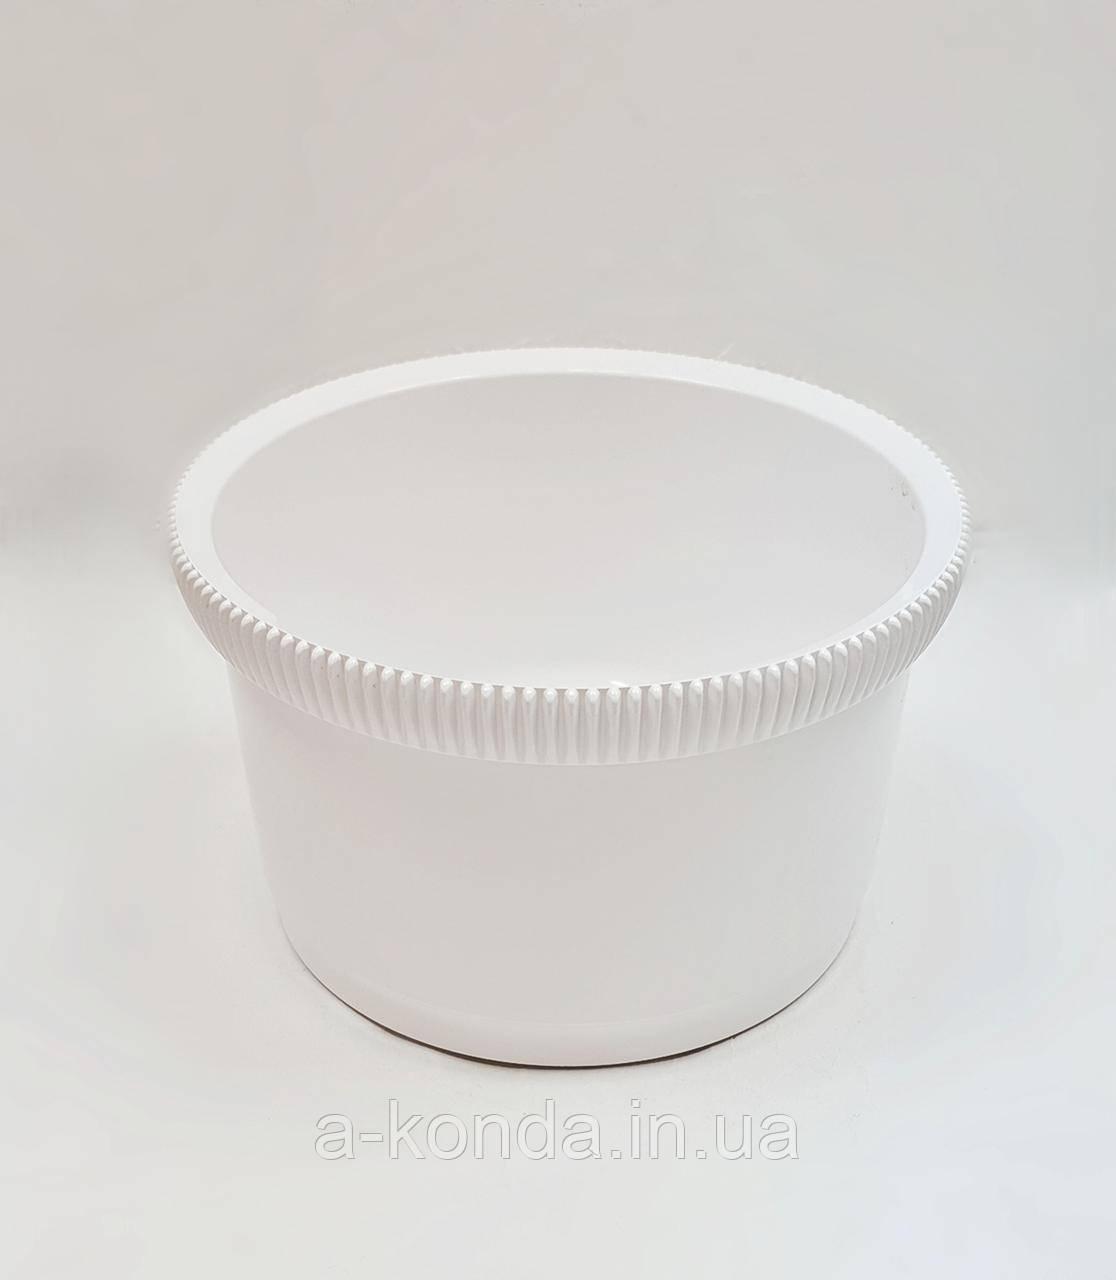 Чаша подставки для миксера Zelmer